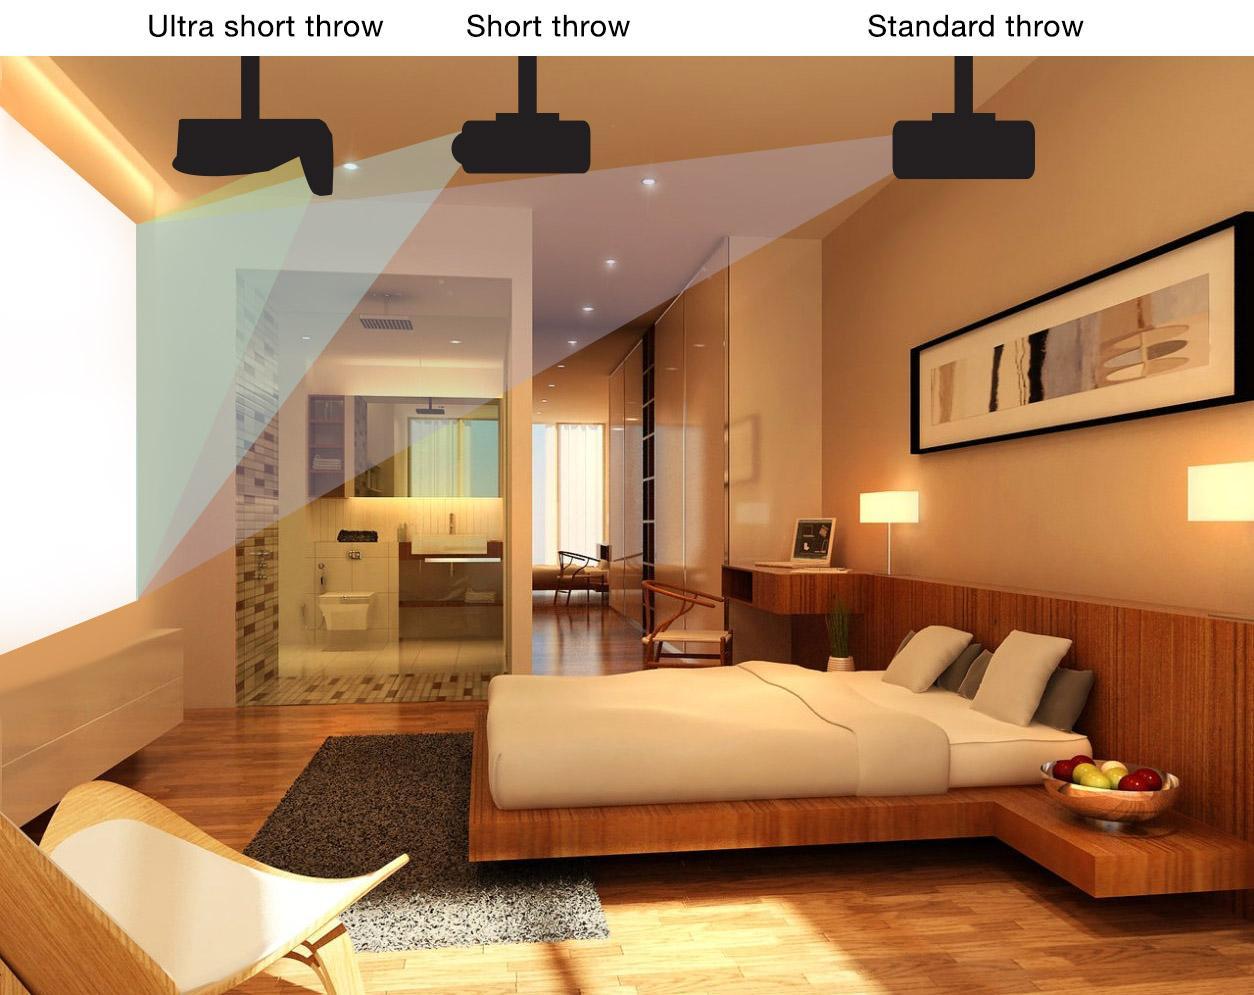 Optoma Hd142x Full Hd Gaming Home Cinema Projector Long